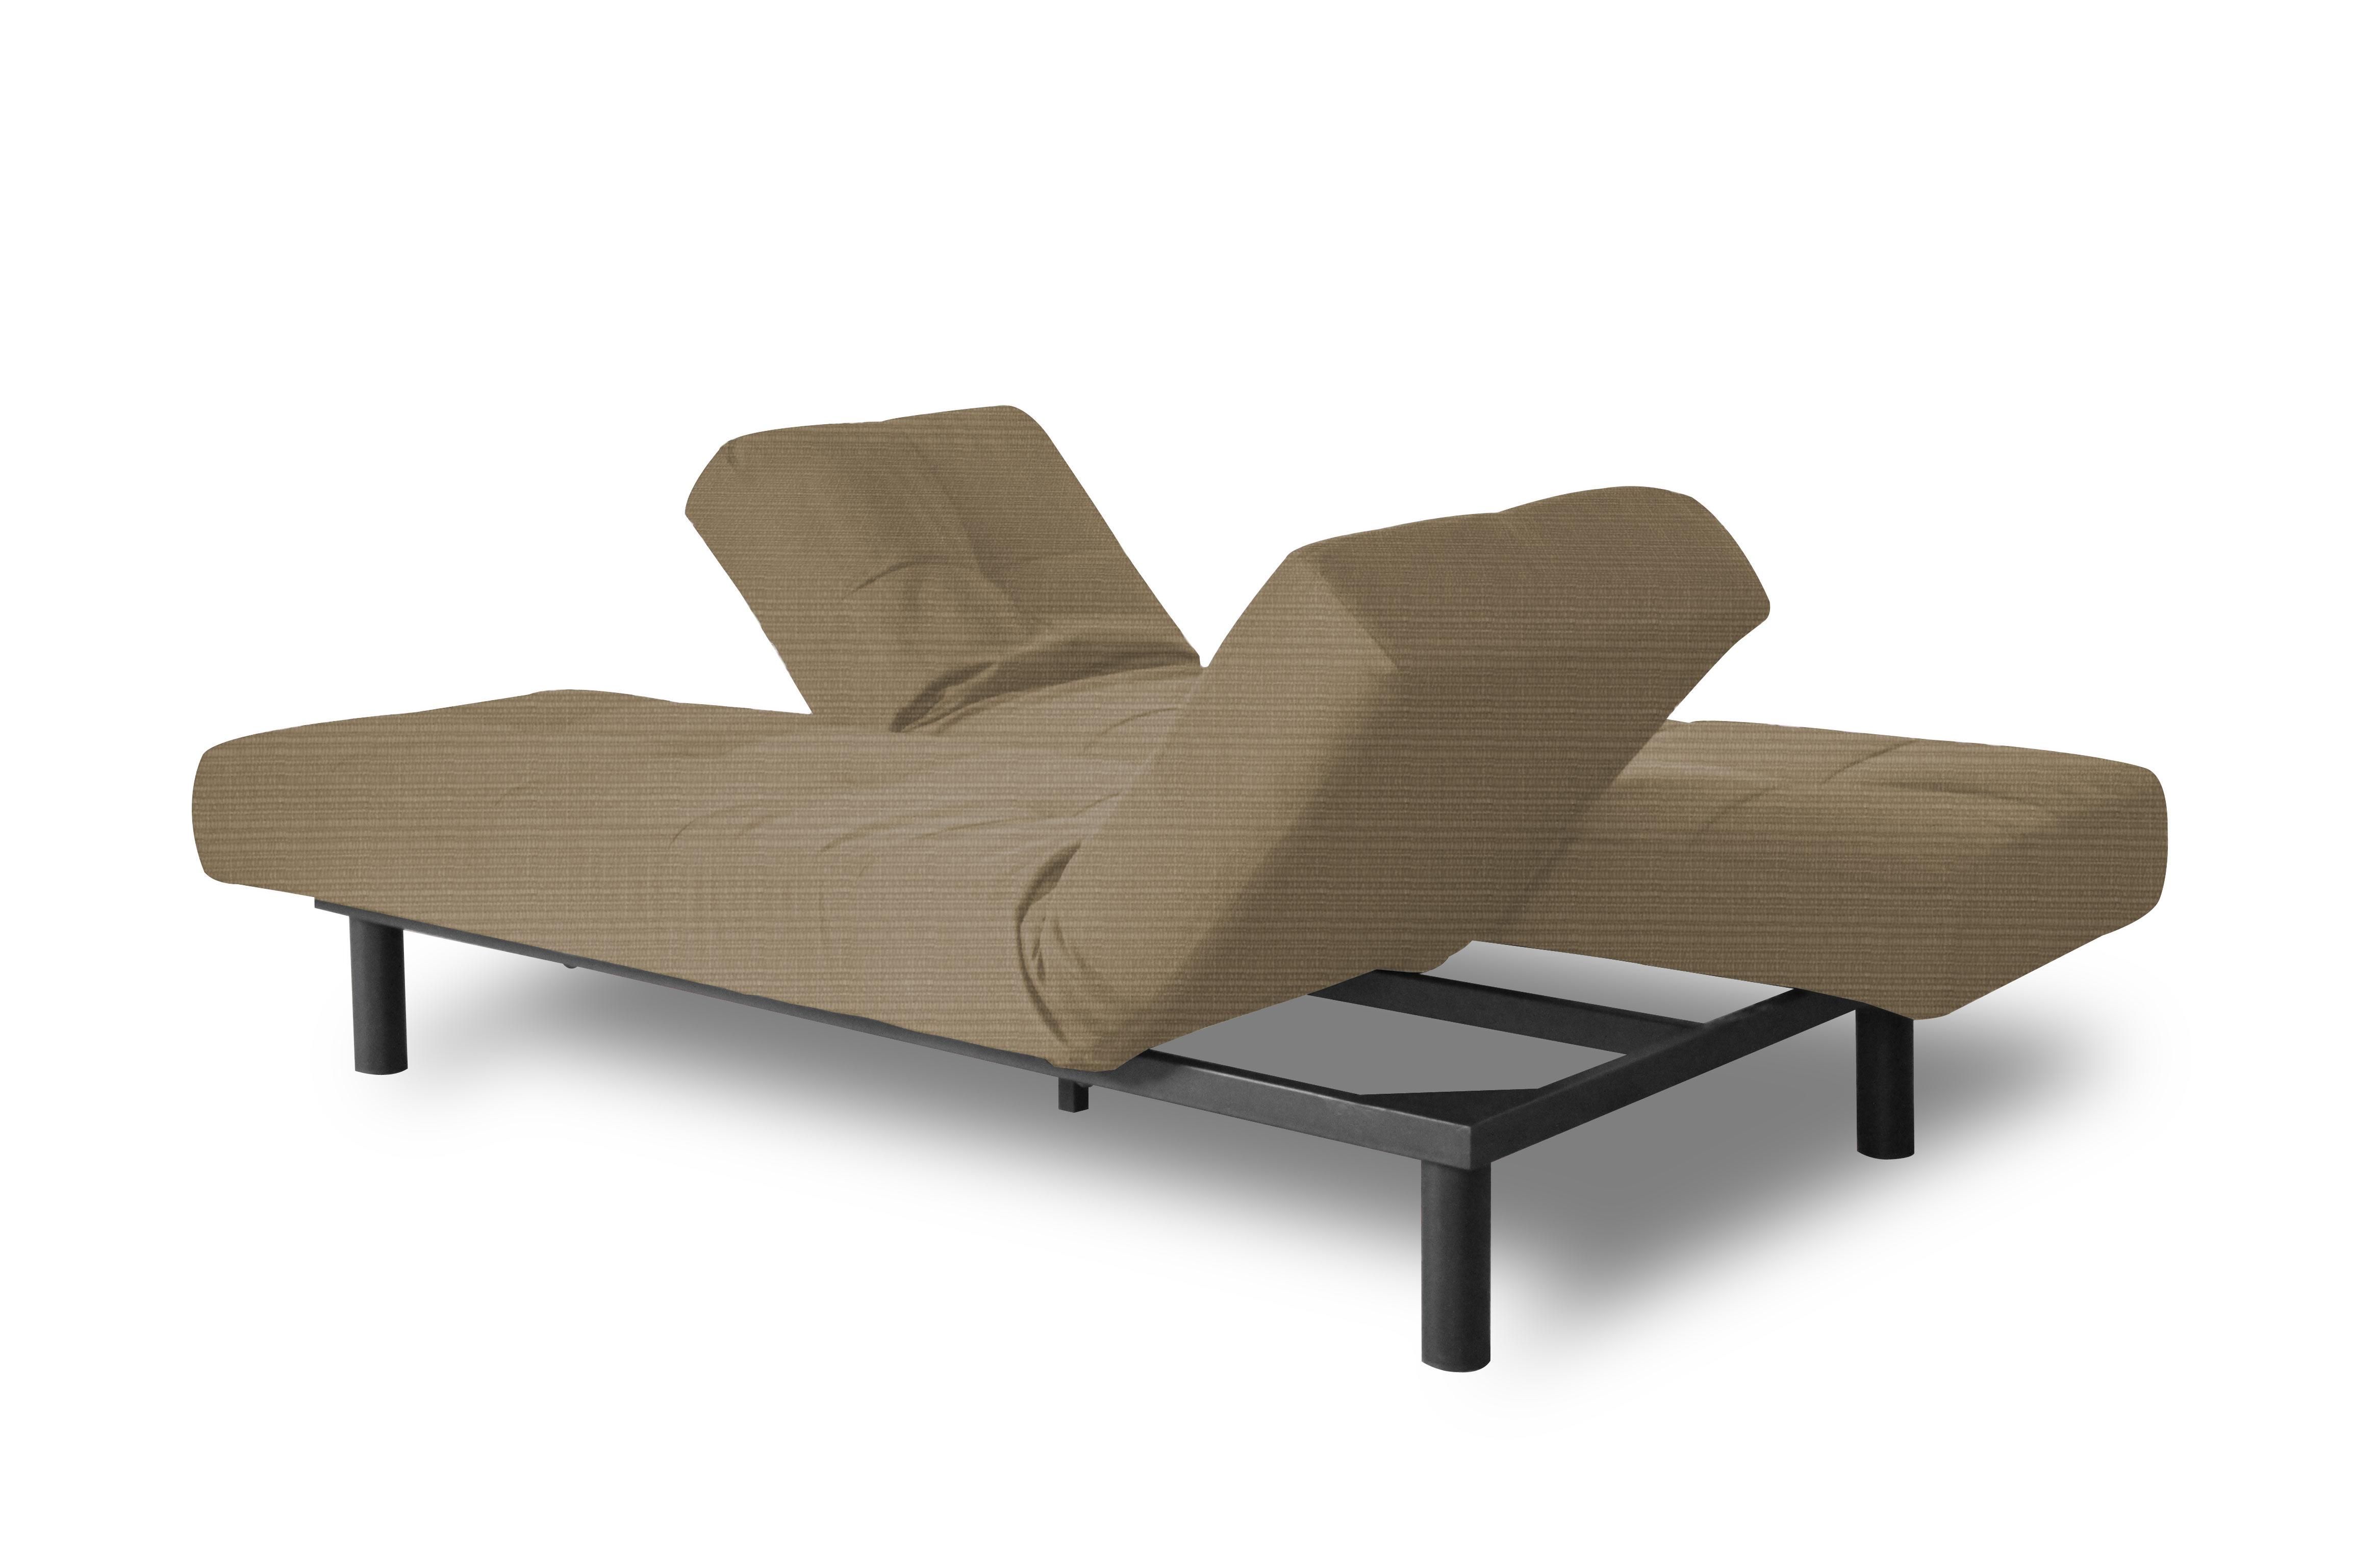 St. Lucia Convertible Sofa Sand by Serta / Lifestyle on chair sofa, recliner sofa, bedroom sofa, fabric sofa, settee sofa, futon sofa, art sofa, bookcase sofa, ottoman sofa, beds sofa, lounge sofa, bench sofa, glider sofa, table sofa, pillow sofa, couch sofa, cushions sofa, divan sofa, mattress sofa, storage sofa,